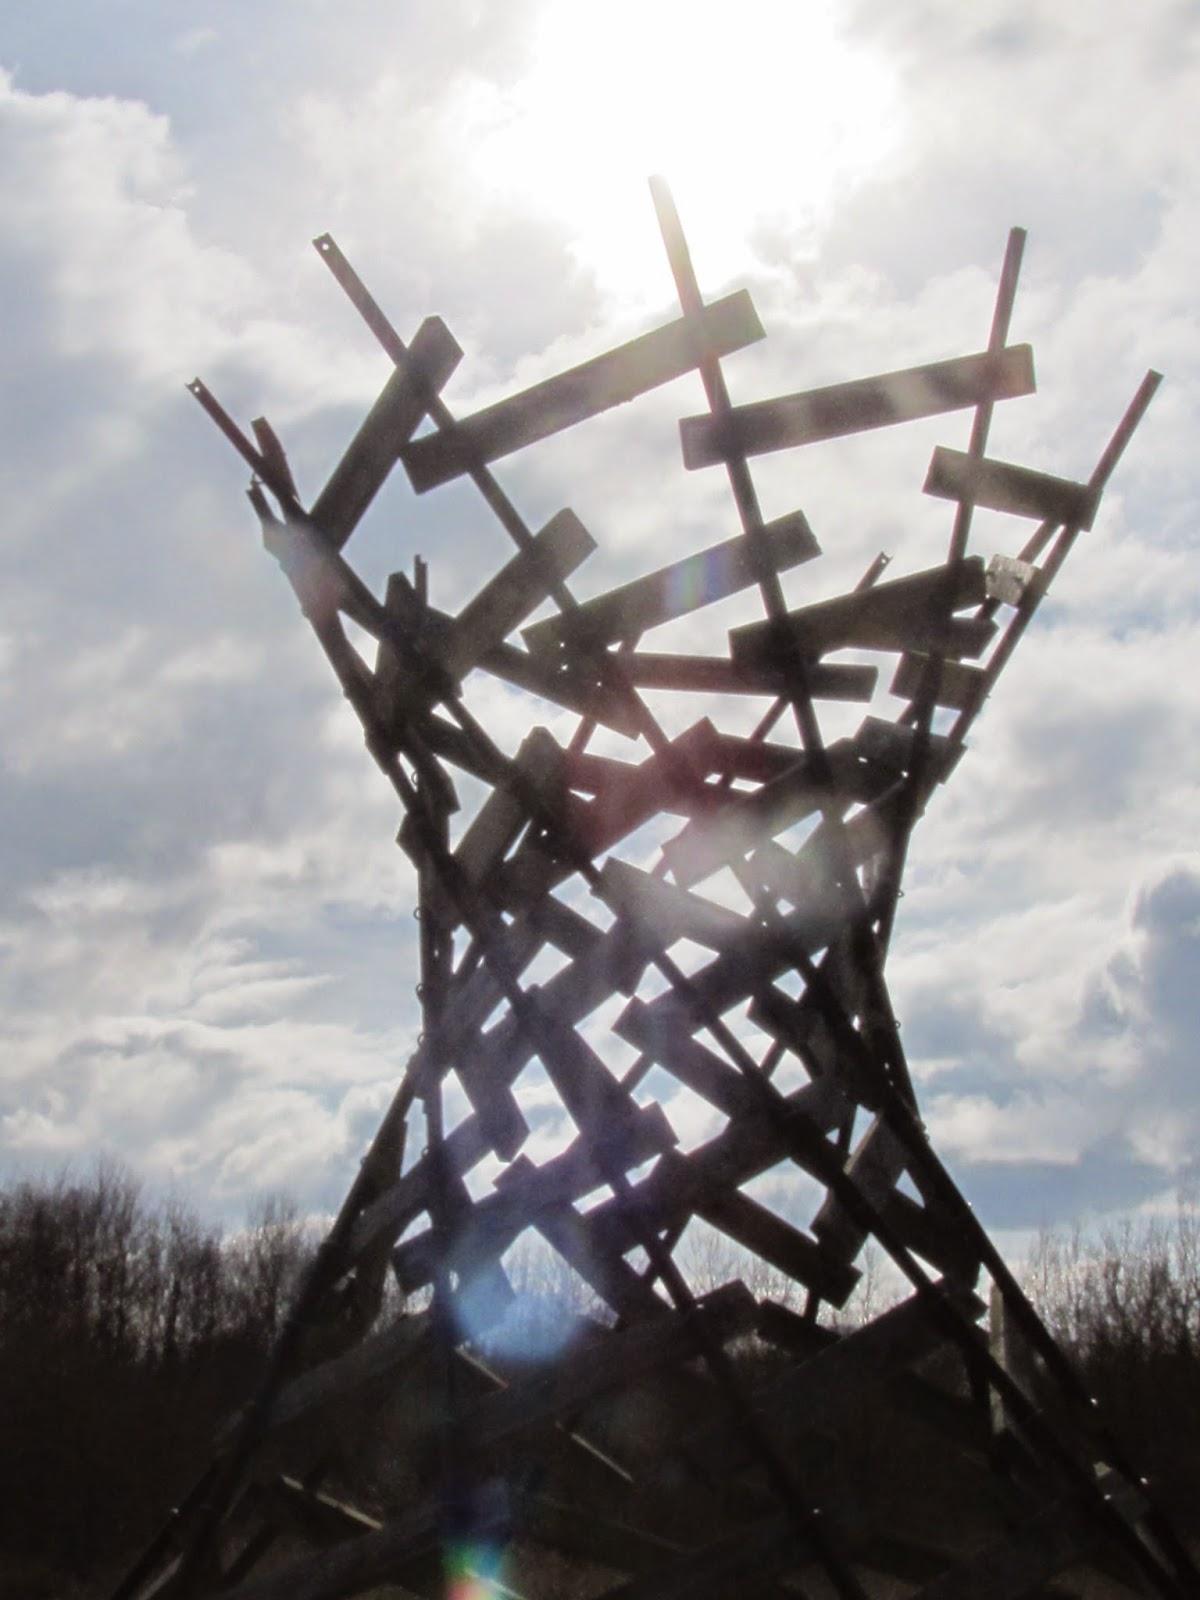 Lough Boora Sculpture Convergence